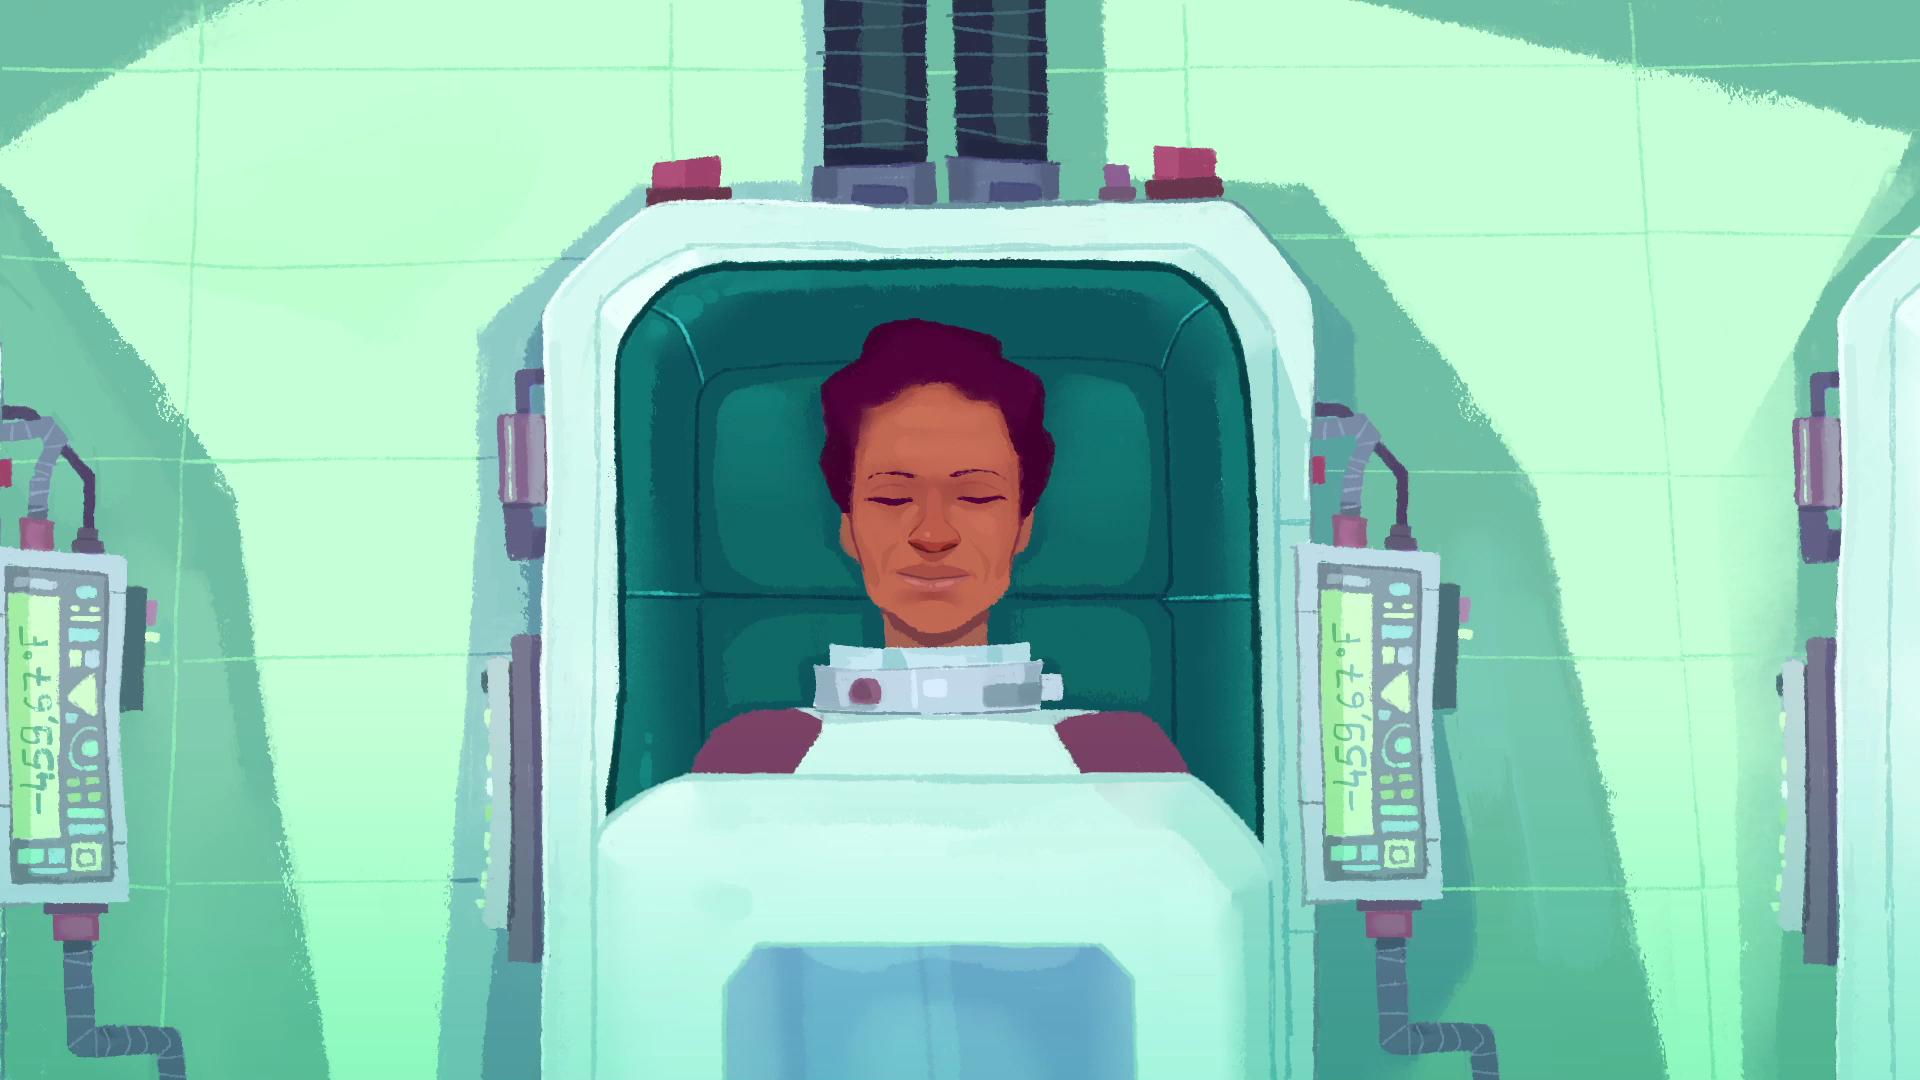 Aomawa Shields is an astronaut